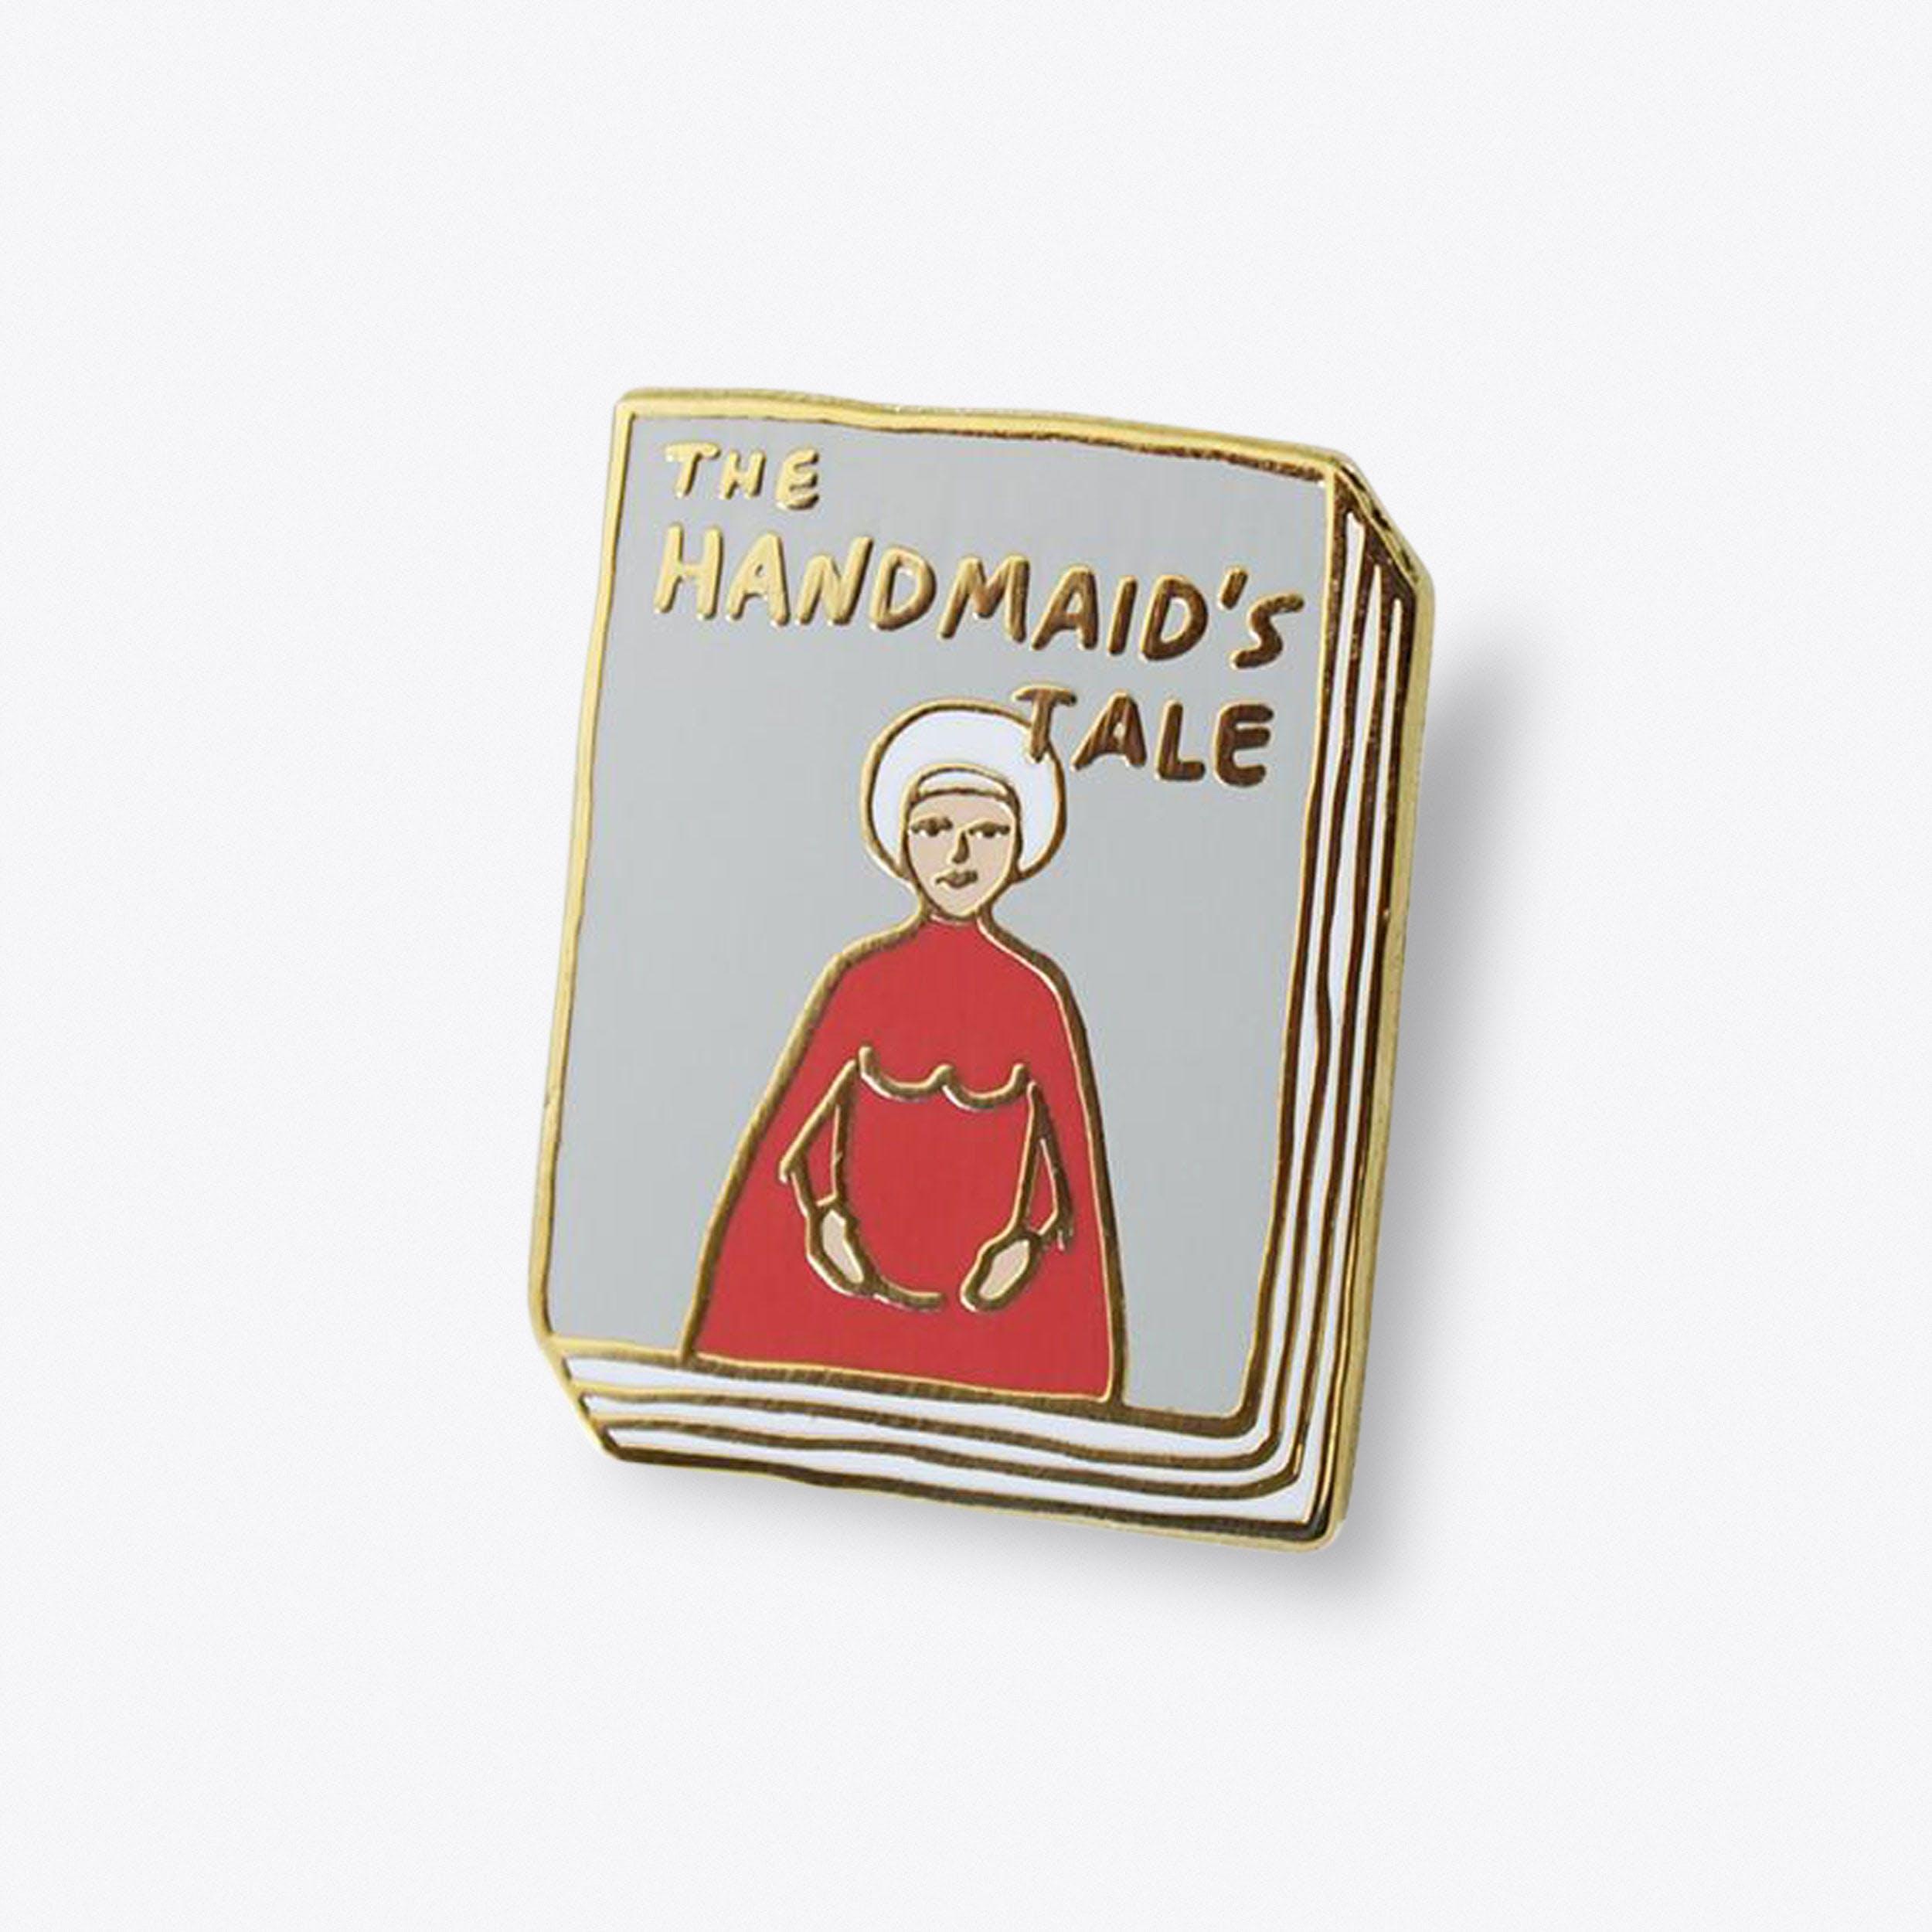 The Handmaidens Tale Pin